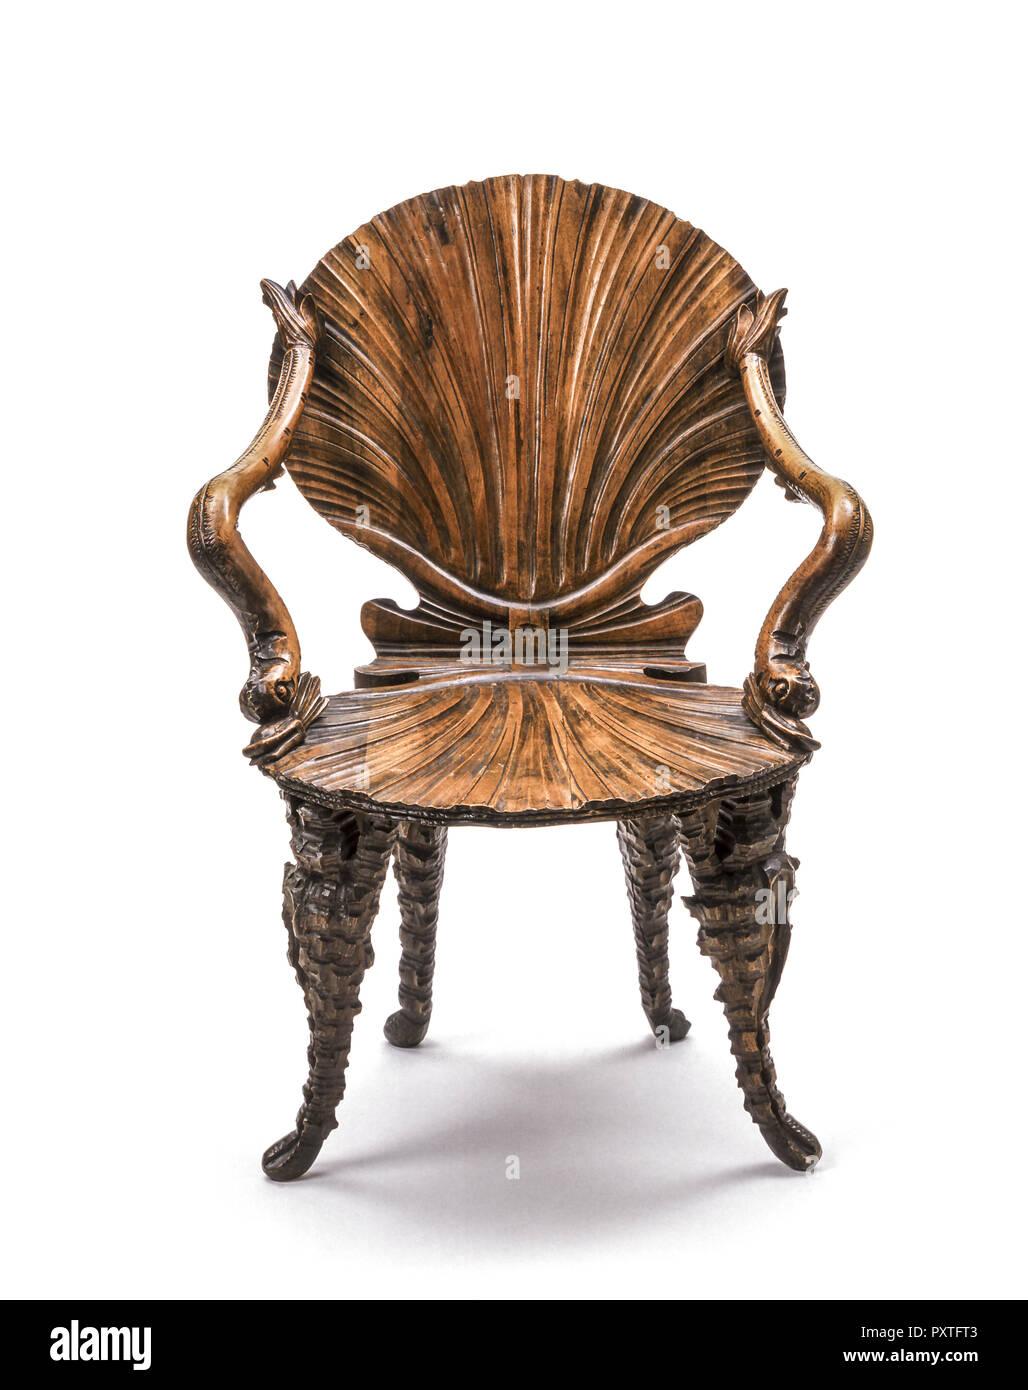 Alter Antiker Stuhl, Antiquitäten, Antique chair, Old, Chair, Antique,  Antiques, Ancient, Furniture, Nobody, Seat, Rarity - Alter Antiker Stuhl, Antiquitäten, Antique Chair, Old, Chair